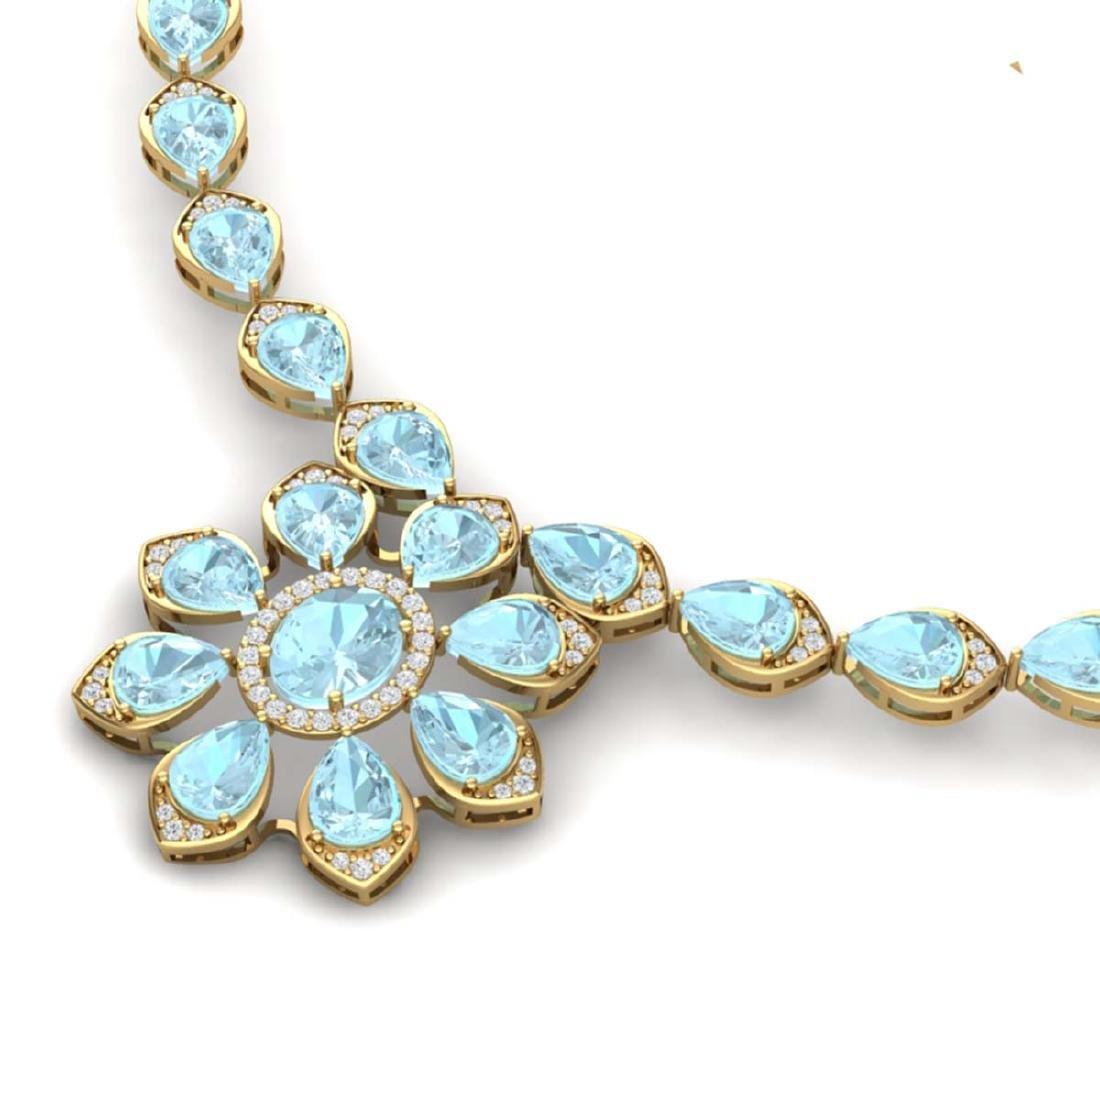 29.34 ctw Sky Topaz & VS Diamond Necklace 18K Yellow - 2